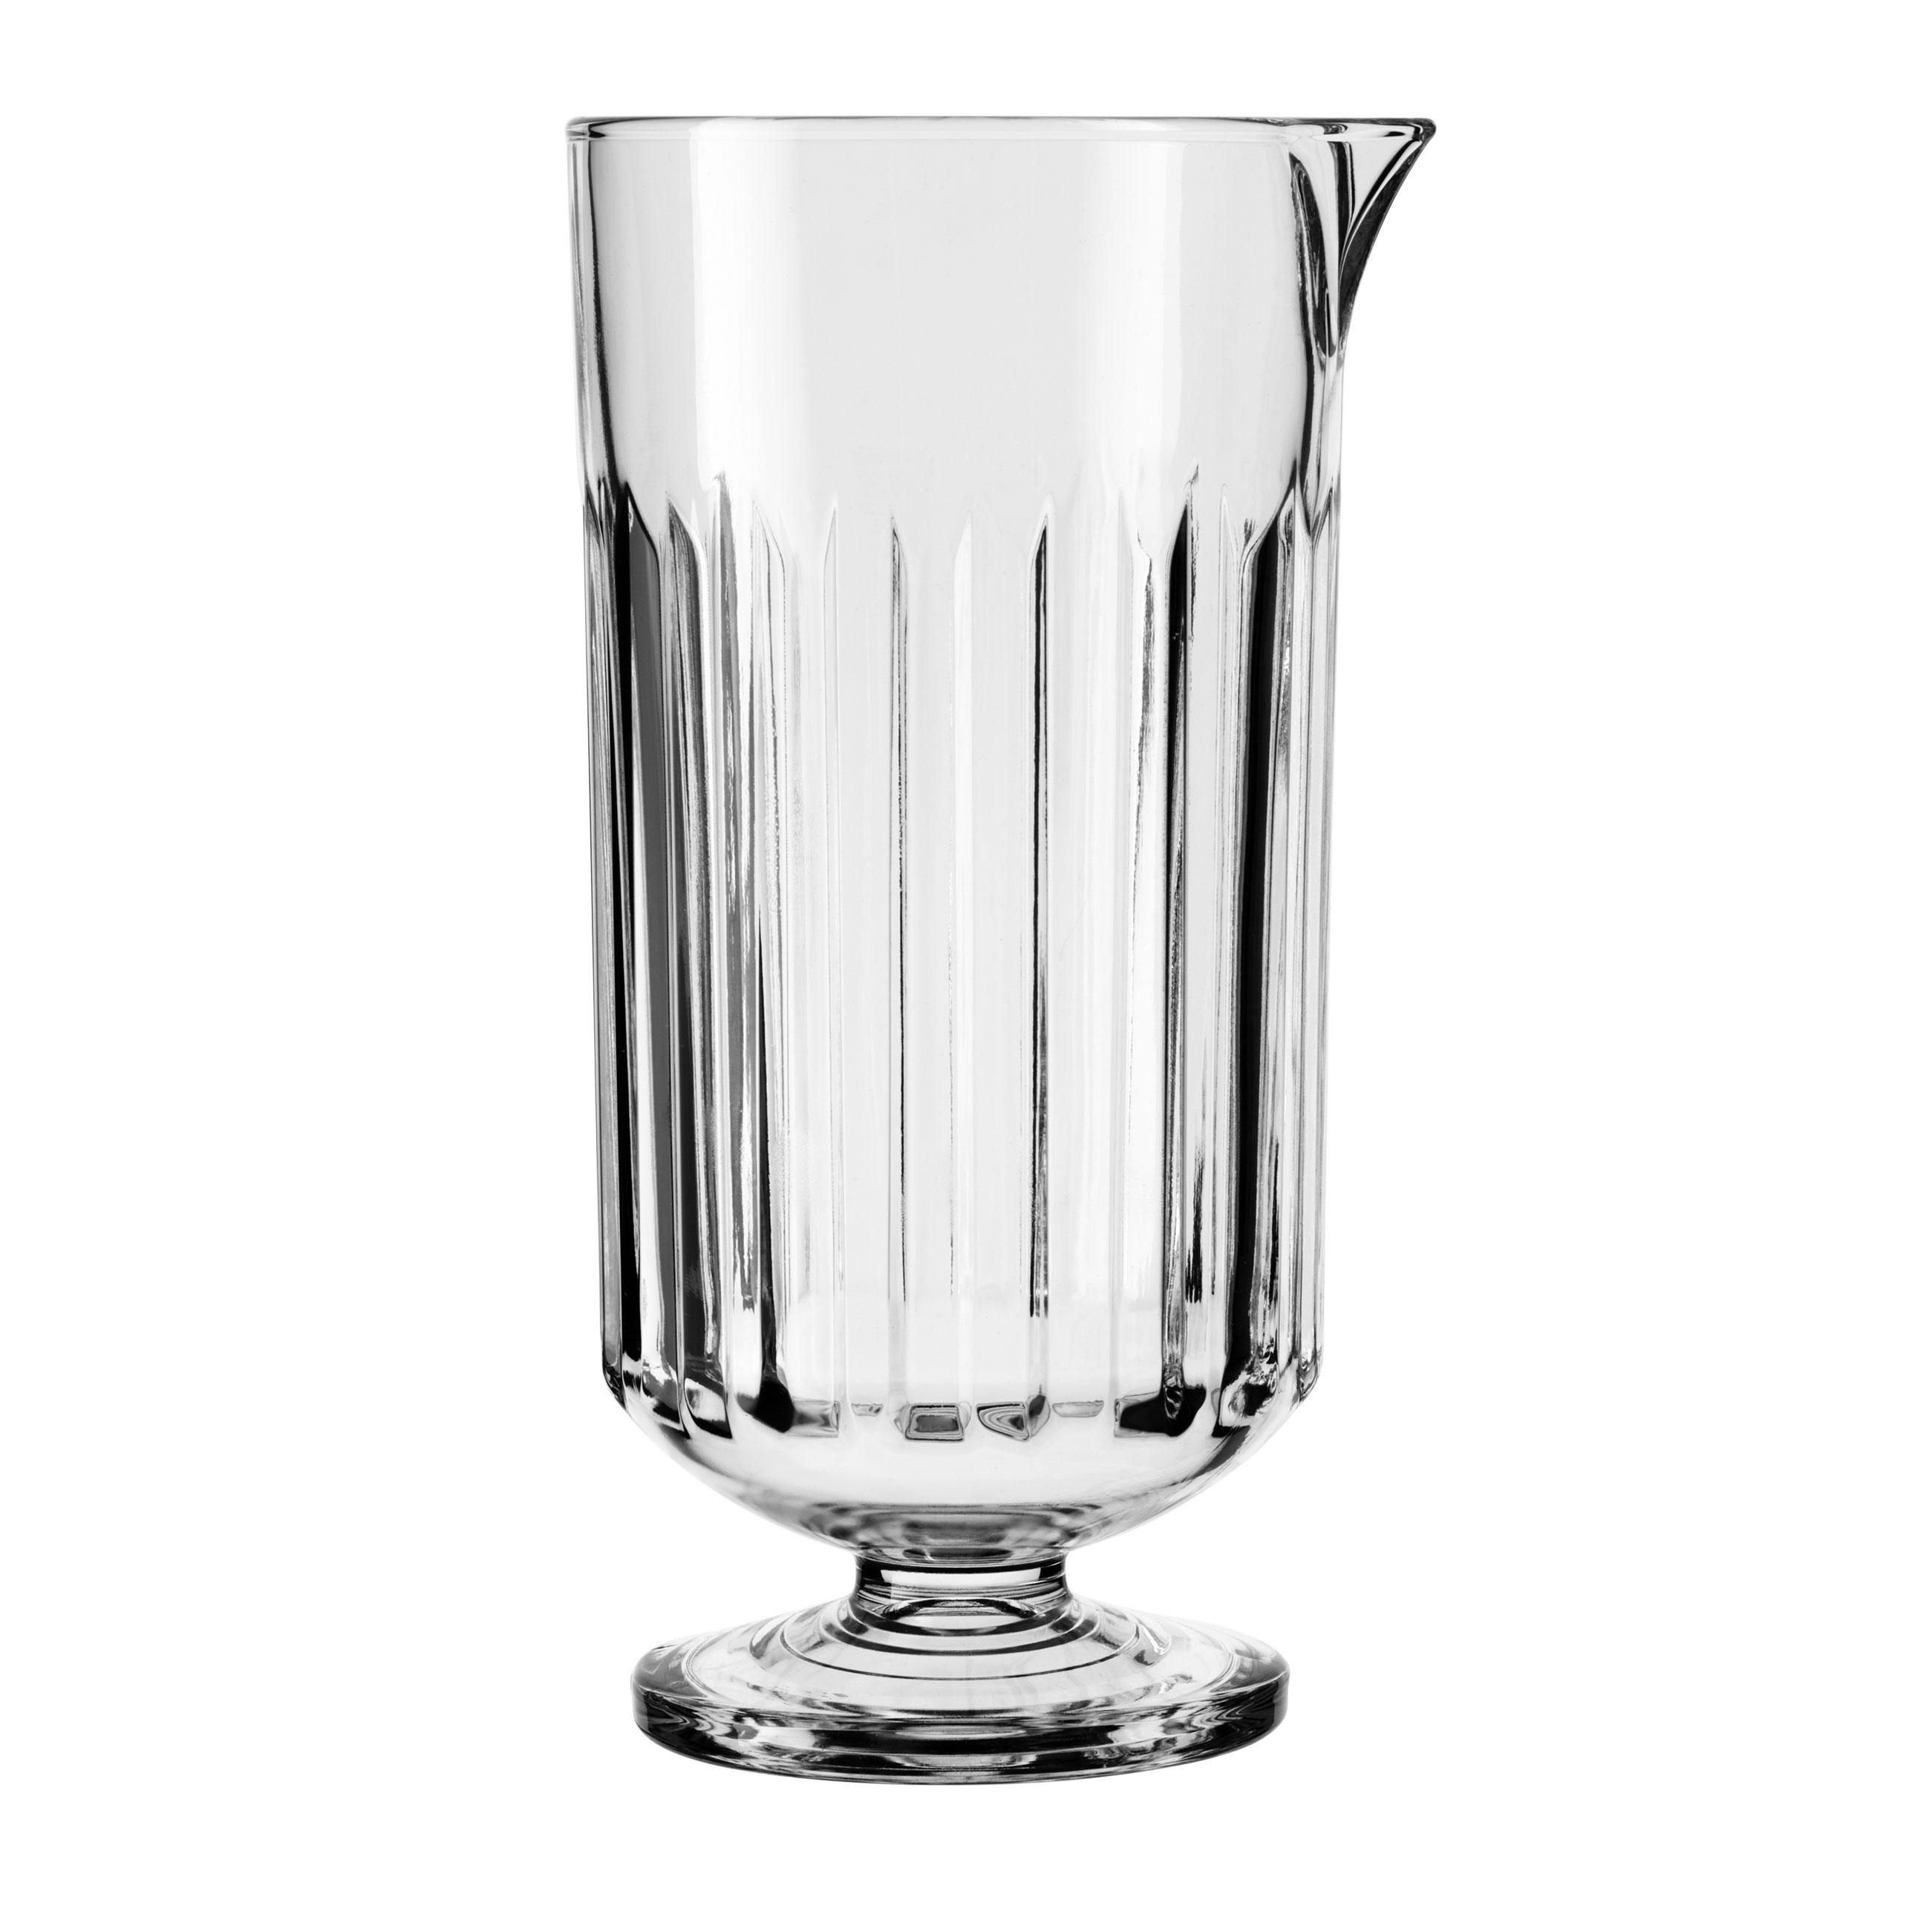 Libbey Glass 2934VJR75 glass, mixing